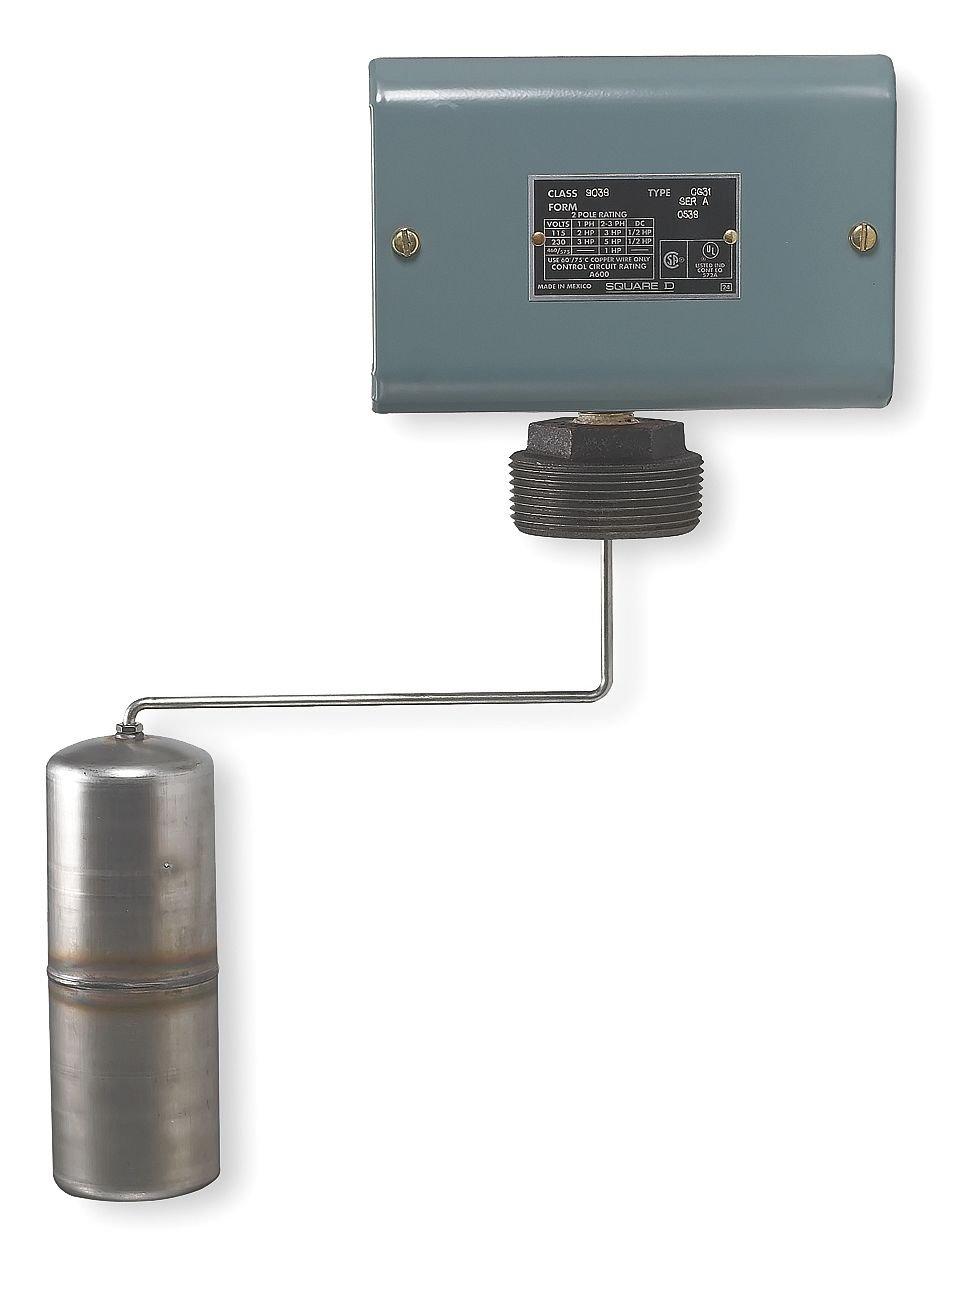 Square D - 9038CG34Z20 - Alternator Tank Liquid Level Switch, Close On Rise, Stainless Steel, 2-1/2 MNPT